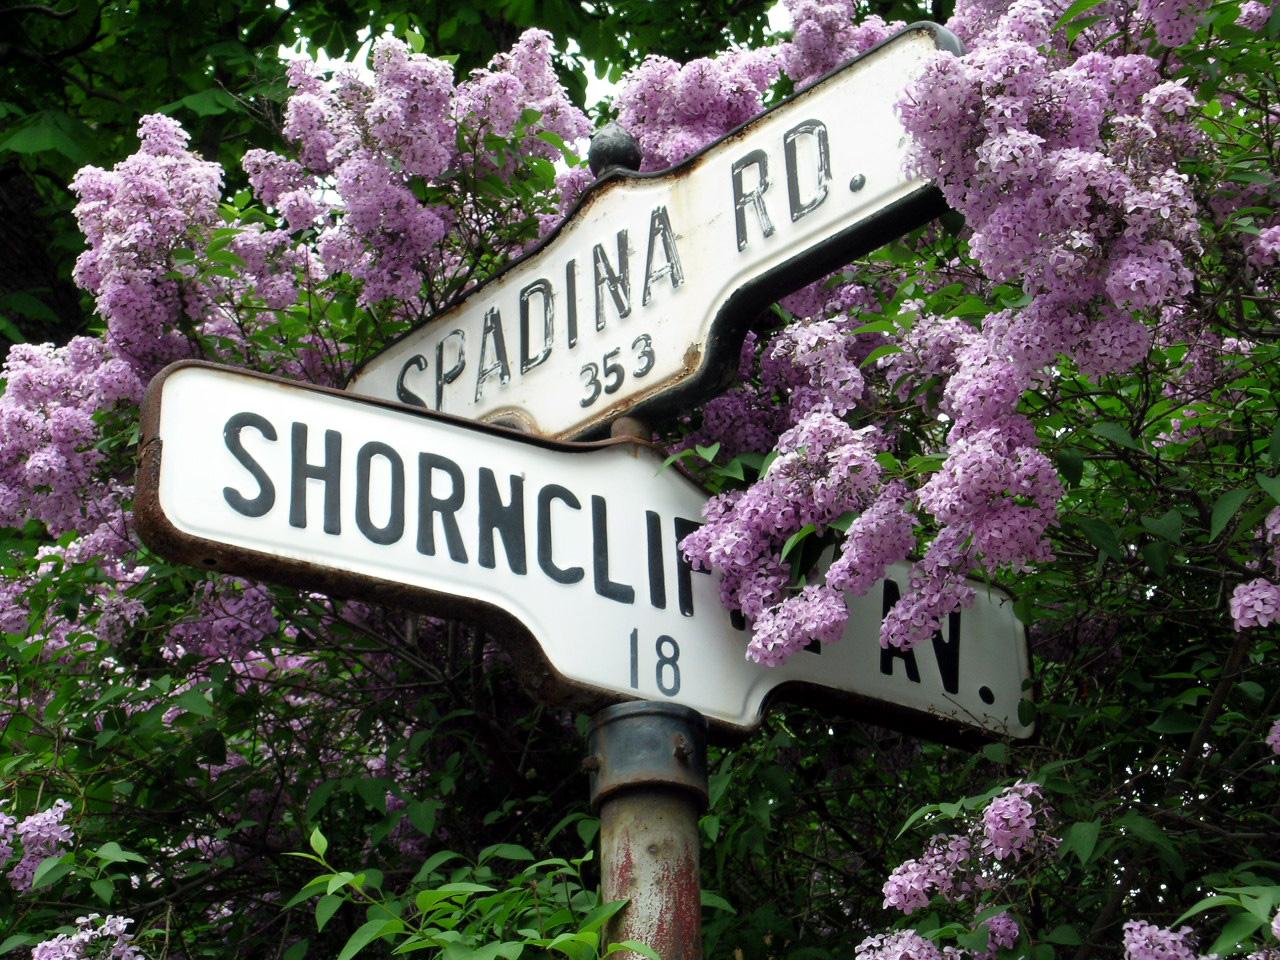 your grandma's hometown?